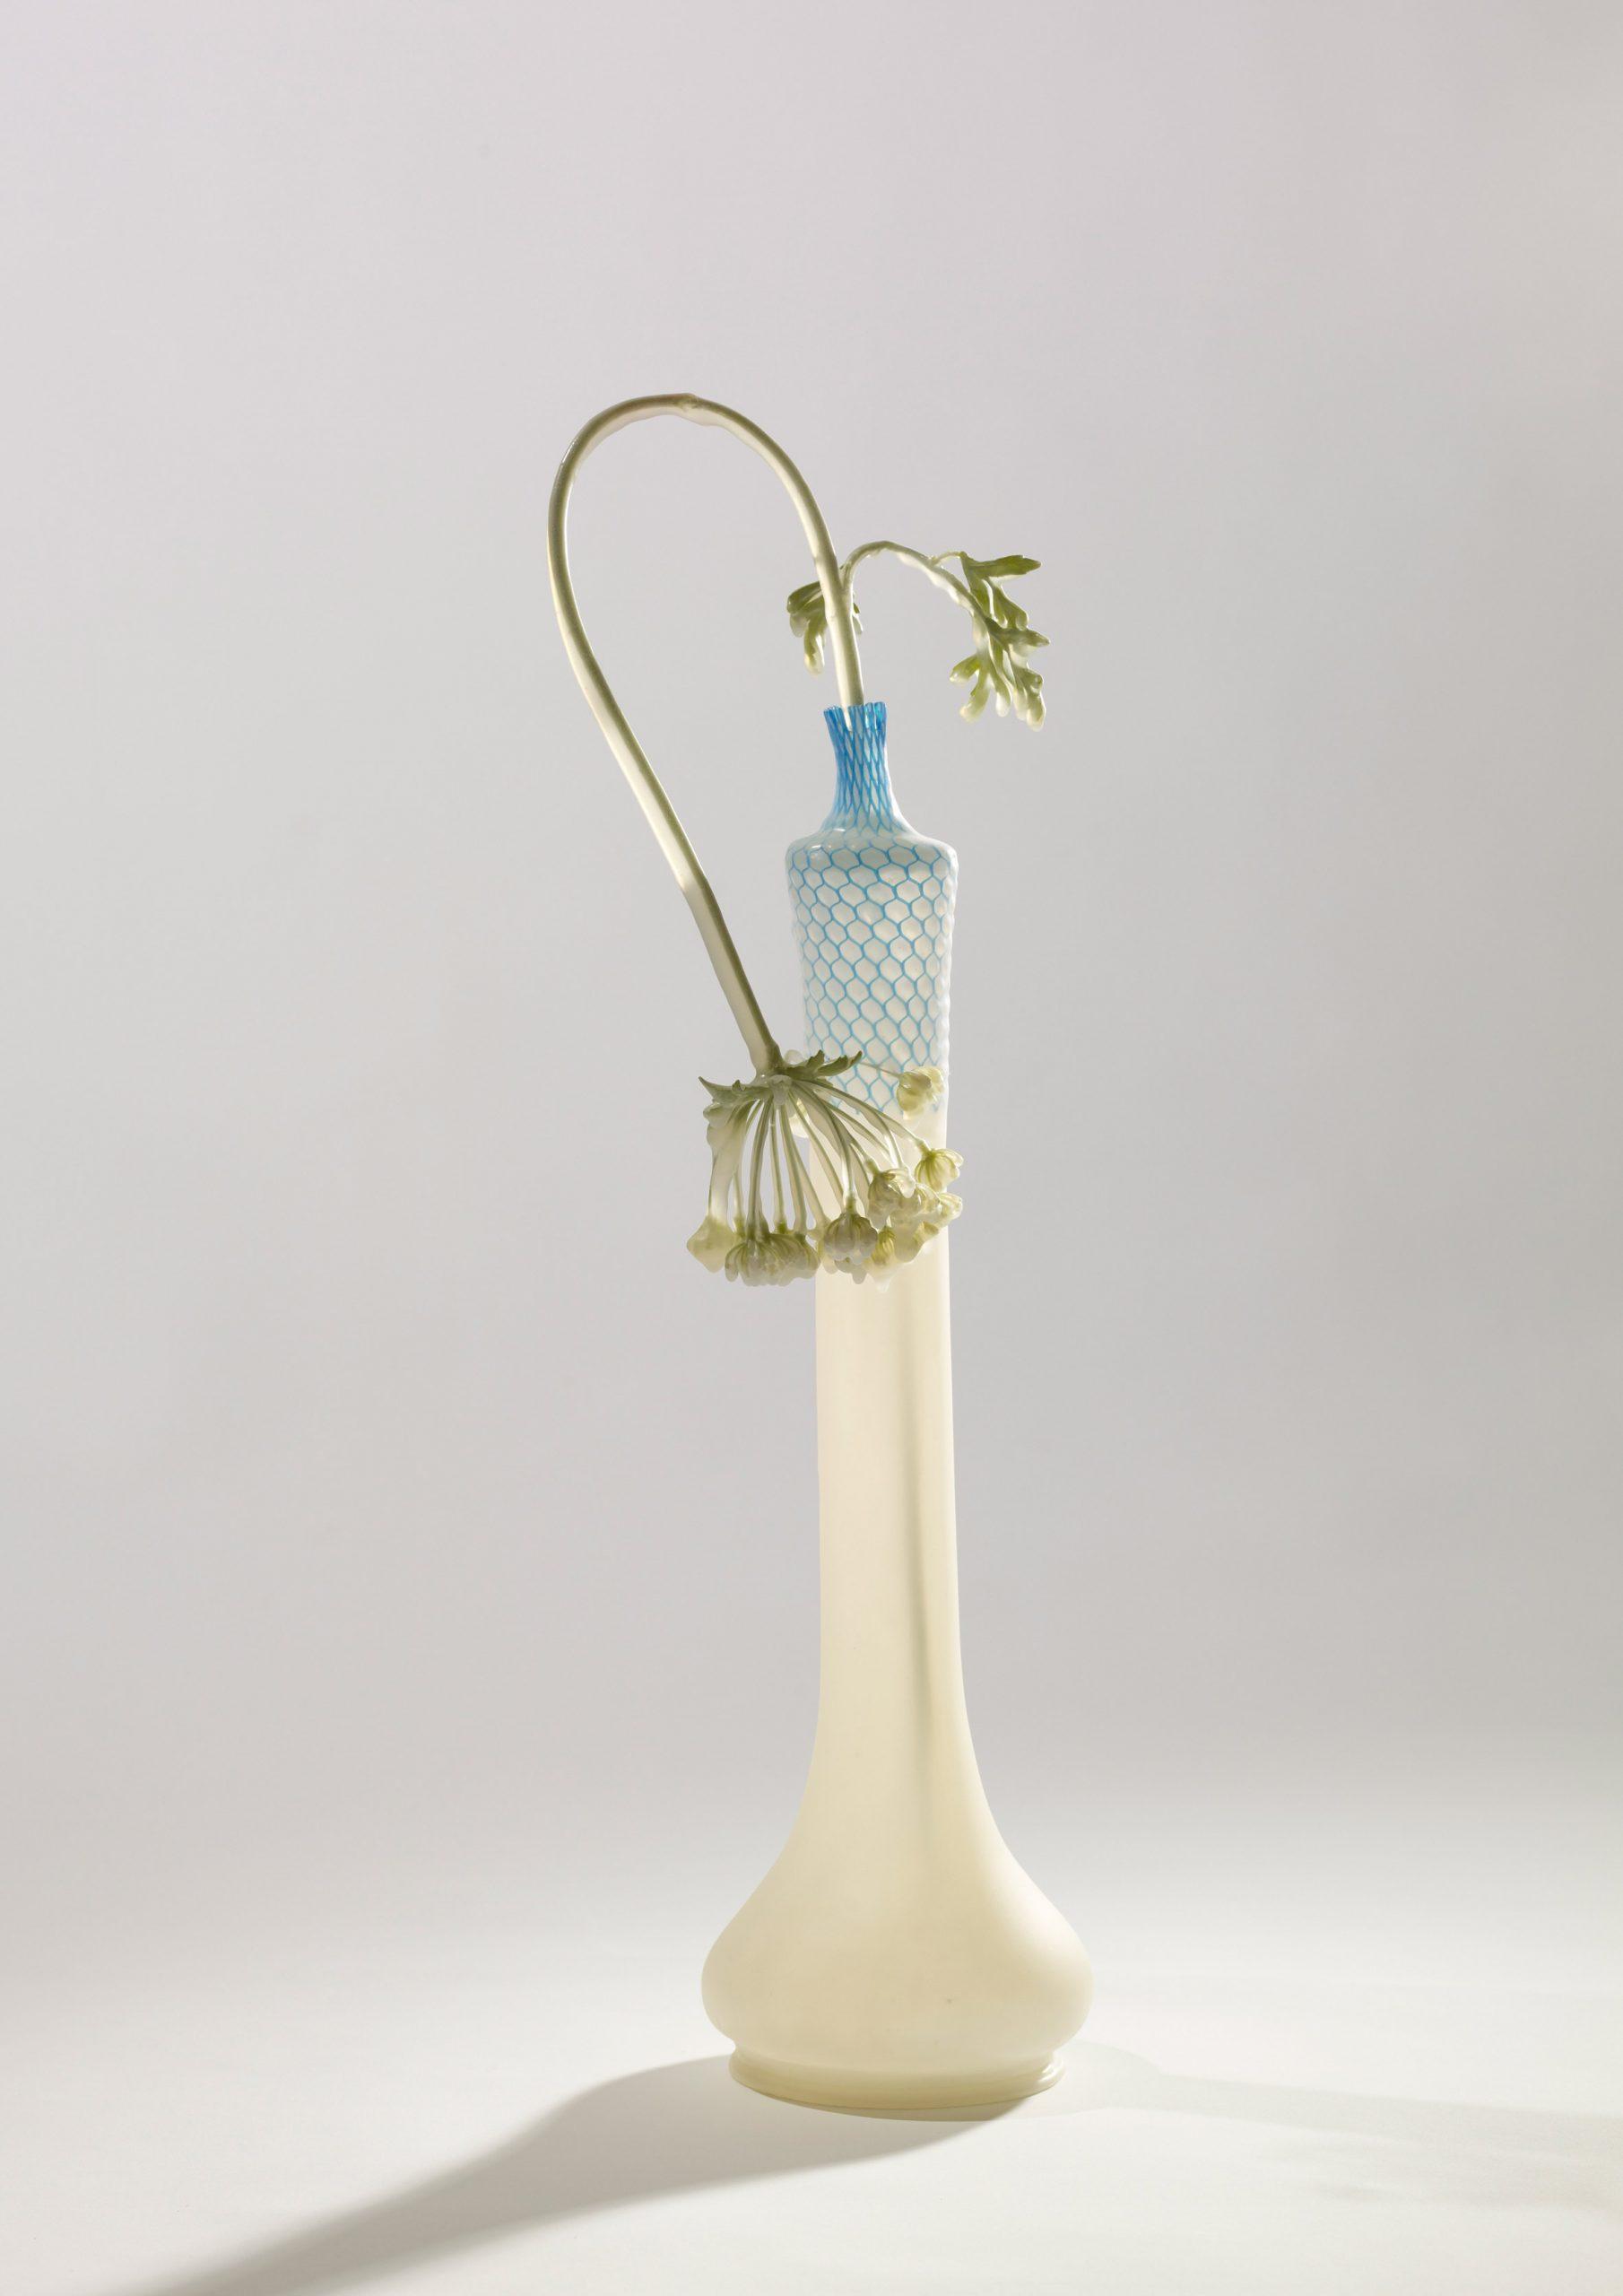 Frozen Hogweed by Wieki Somers at Friedman Benda's Split Personality exhibition